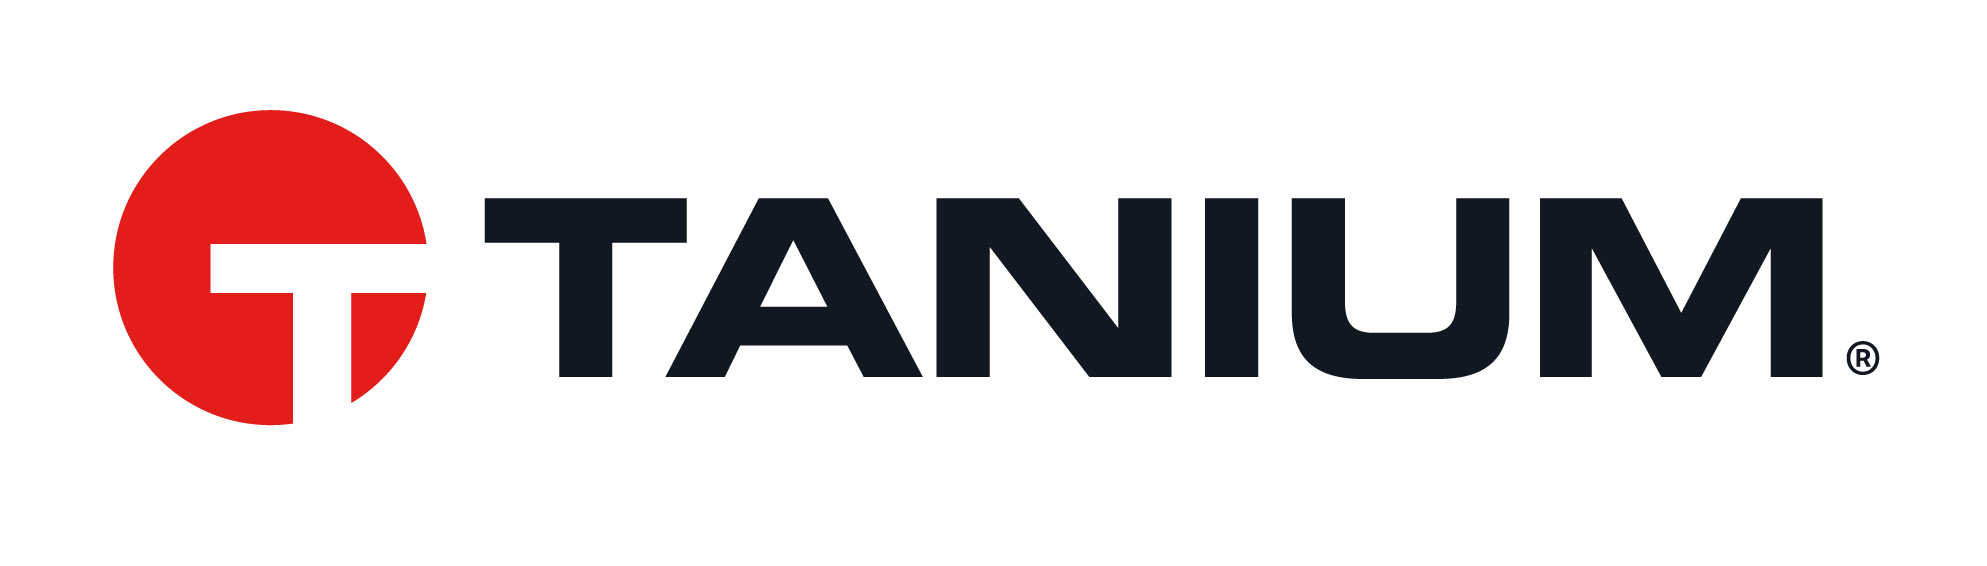 Tanium-Logo-FullColor-Positive